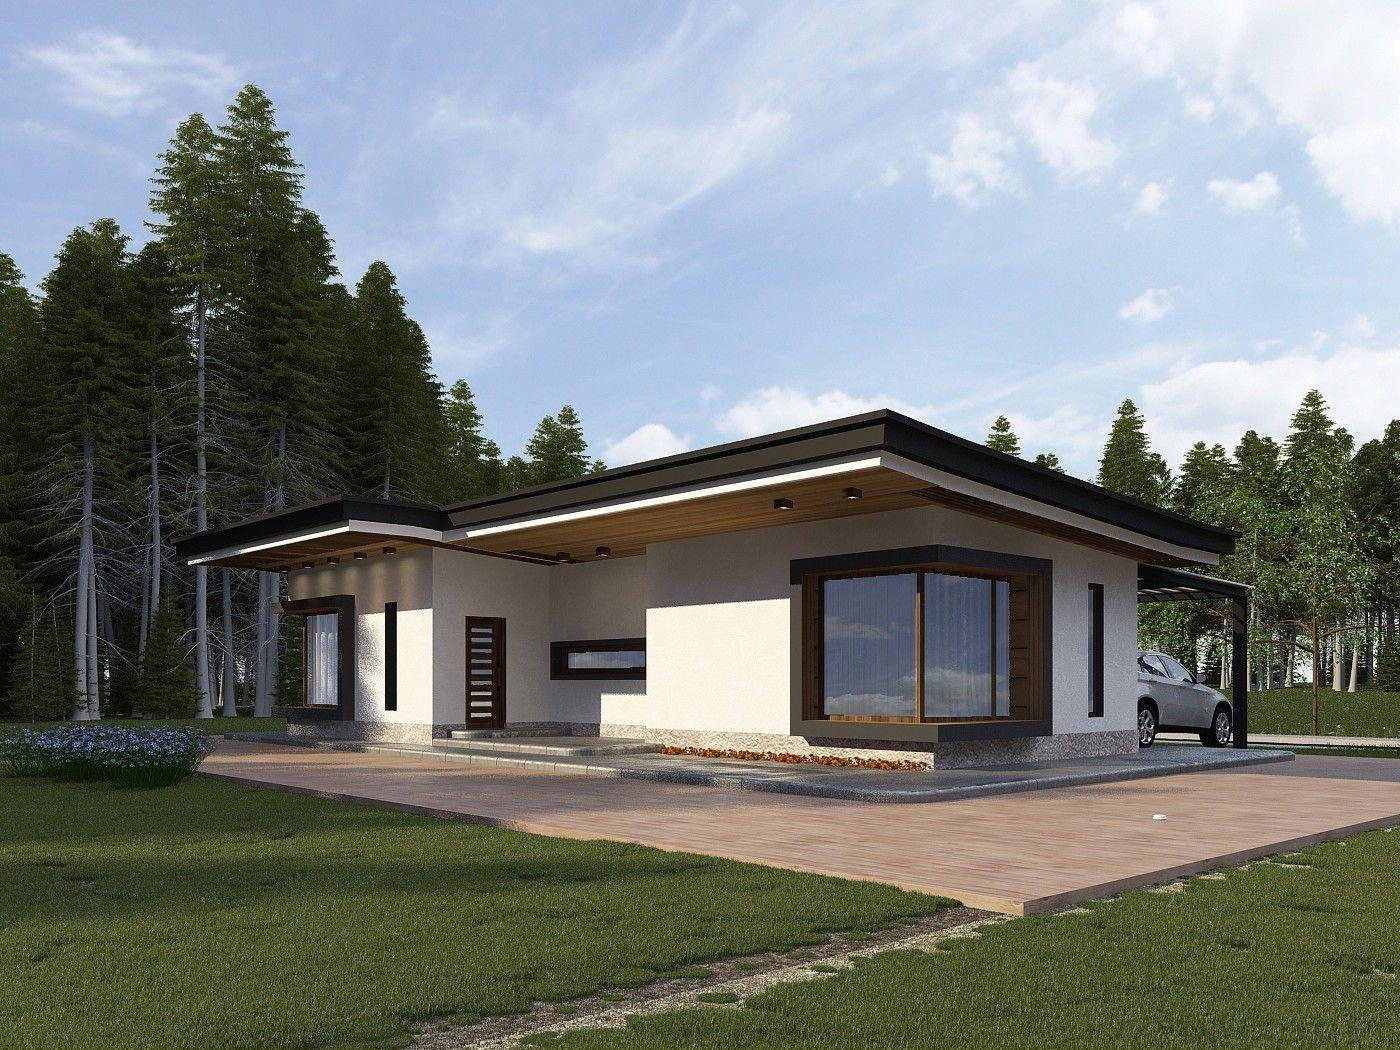 Дом в стиле конструктивизма: проект архитектуры